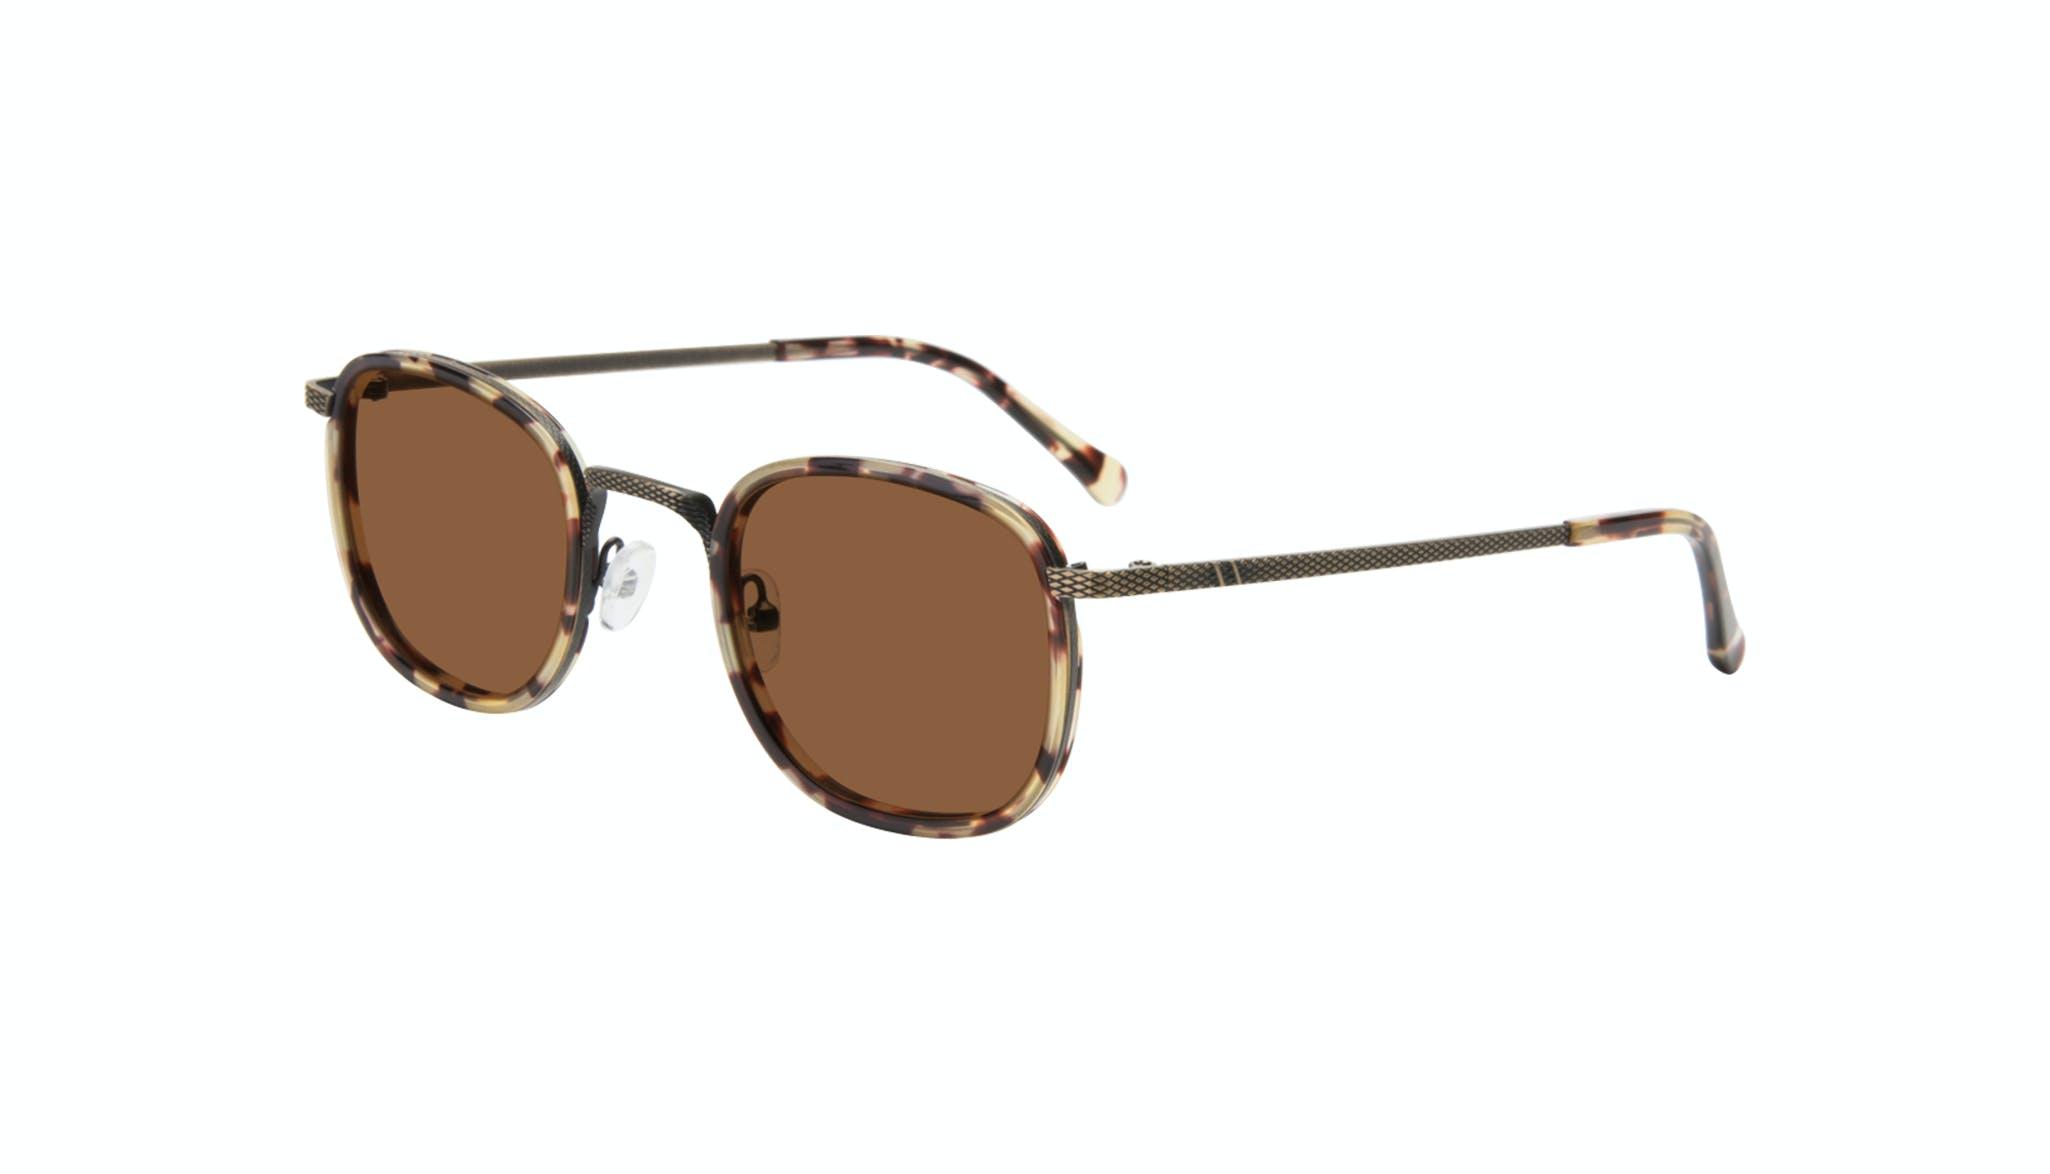 Affordable Fashion Glasses Square Sunglasses Men Swell Antique Tort Tilt